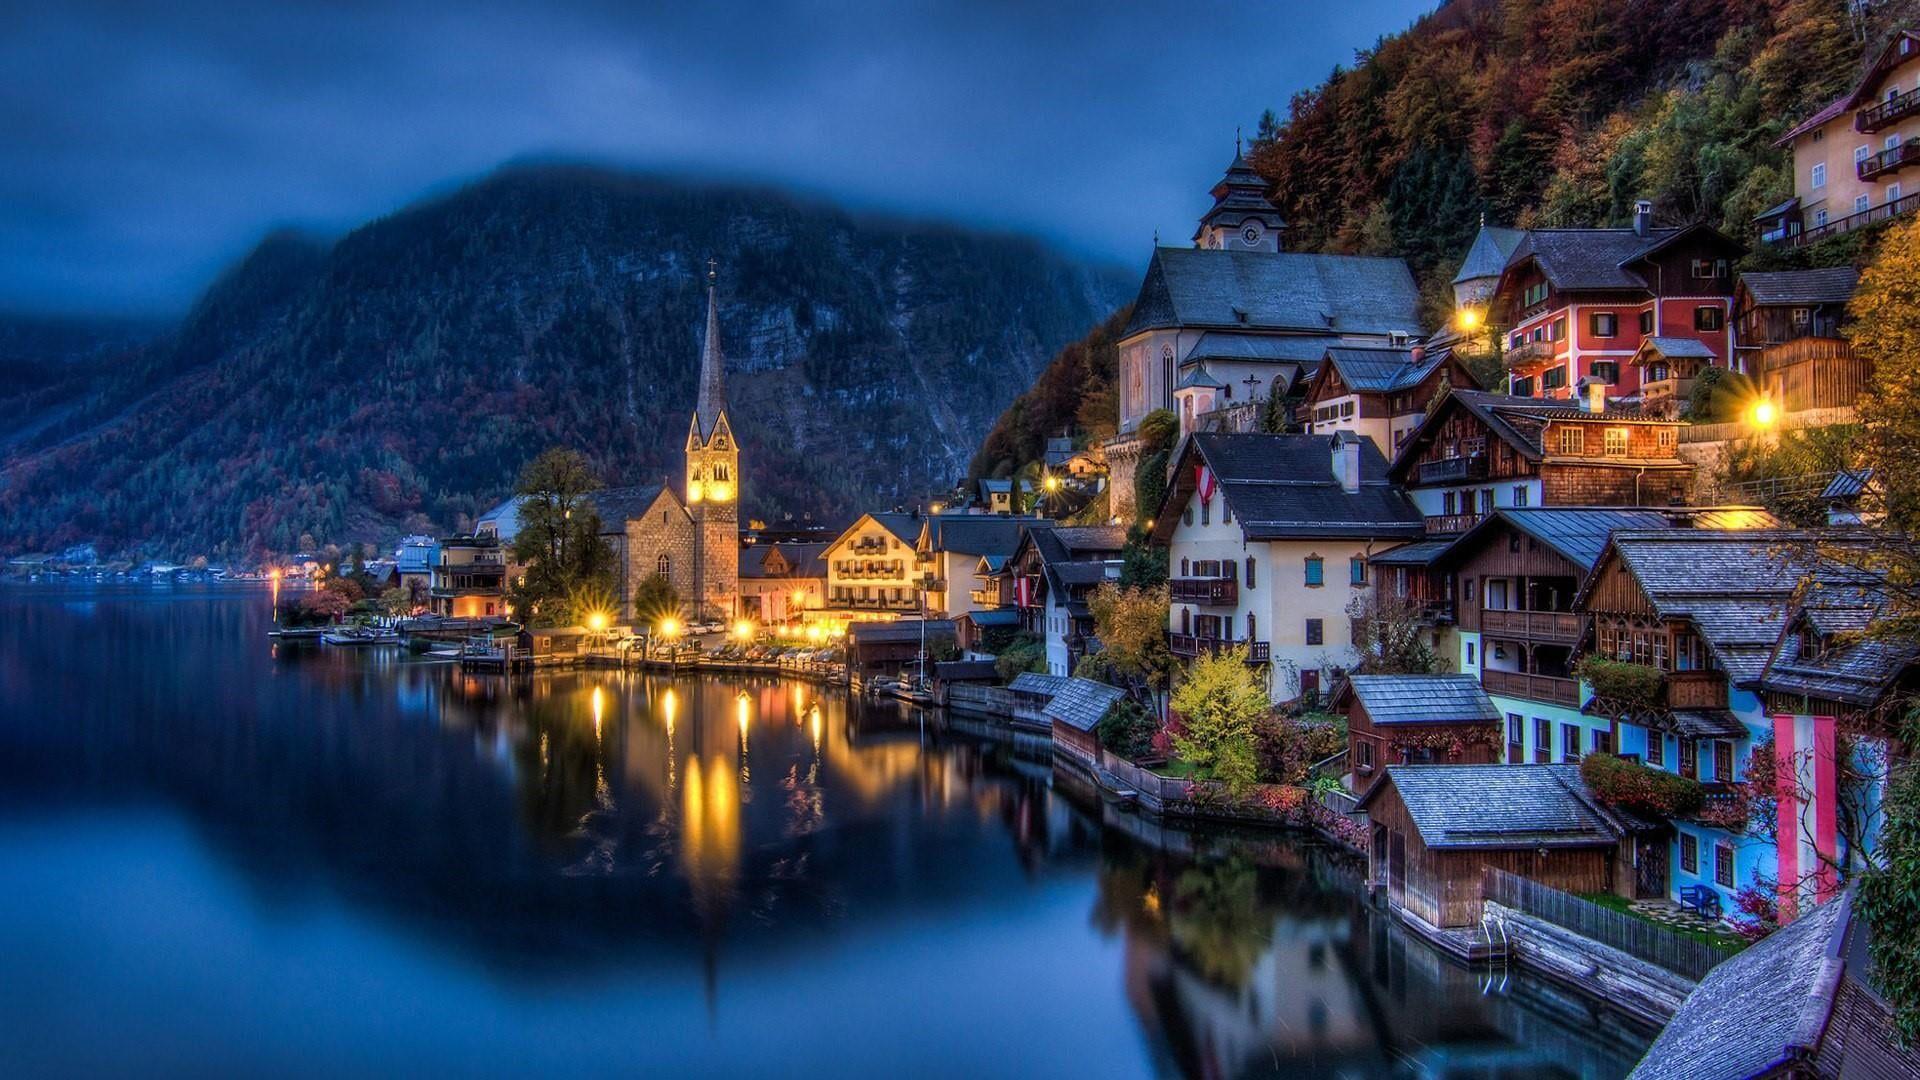 Cityscape Night Hallstatt See Lake Chruch Austria Village